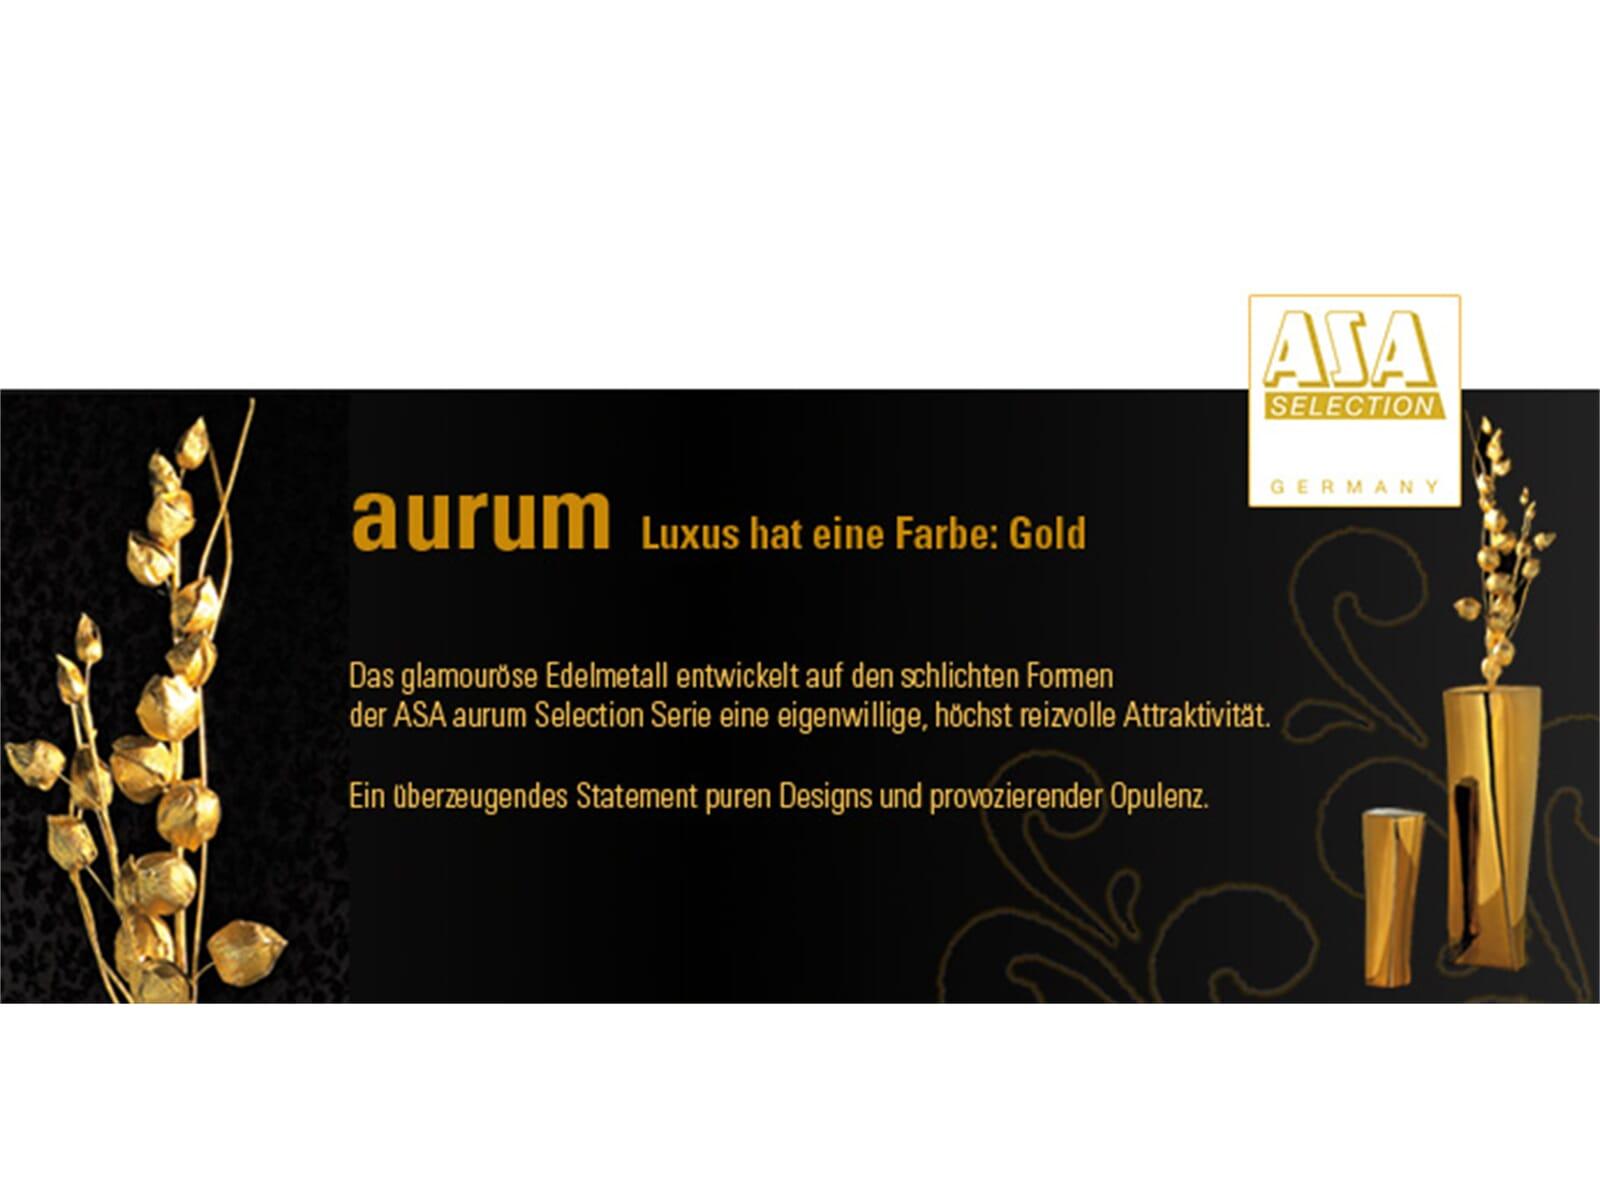 ASA aurum Selection Serie